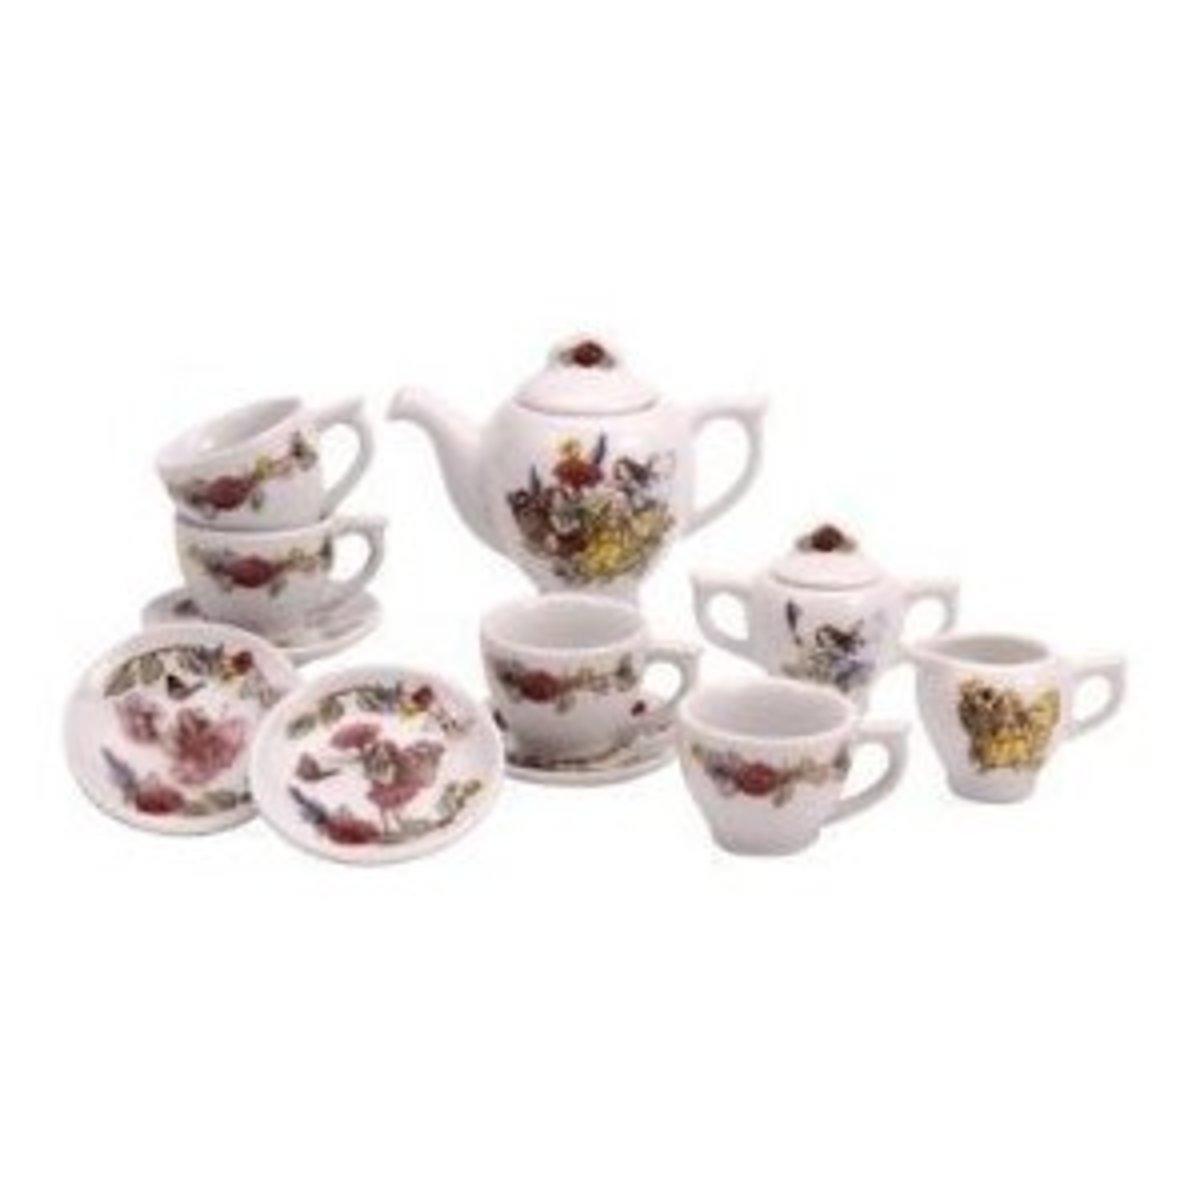 Flower Fairies Tea Set